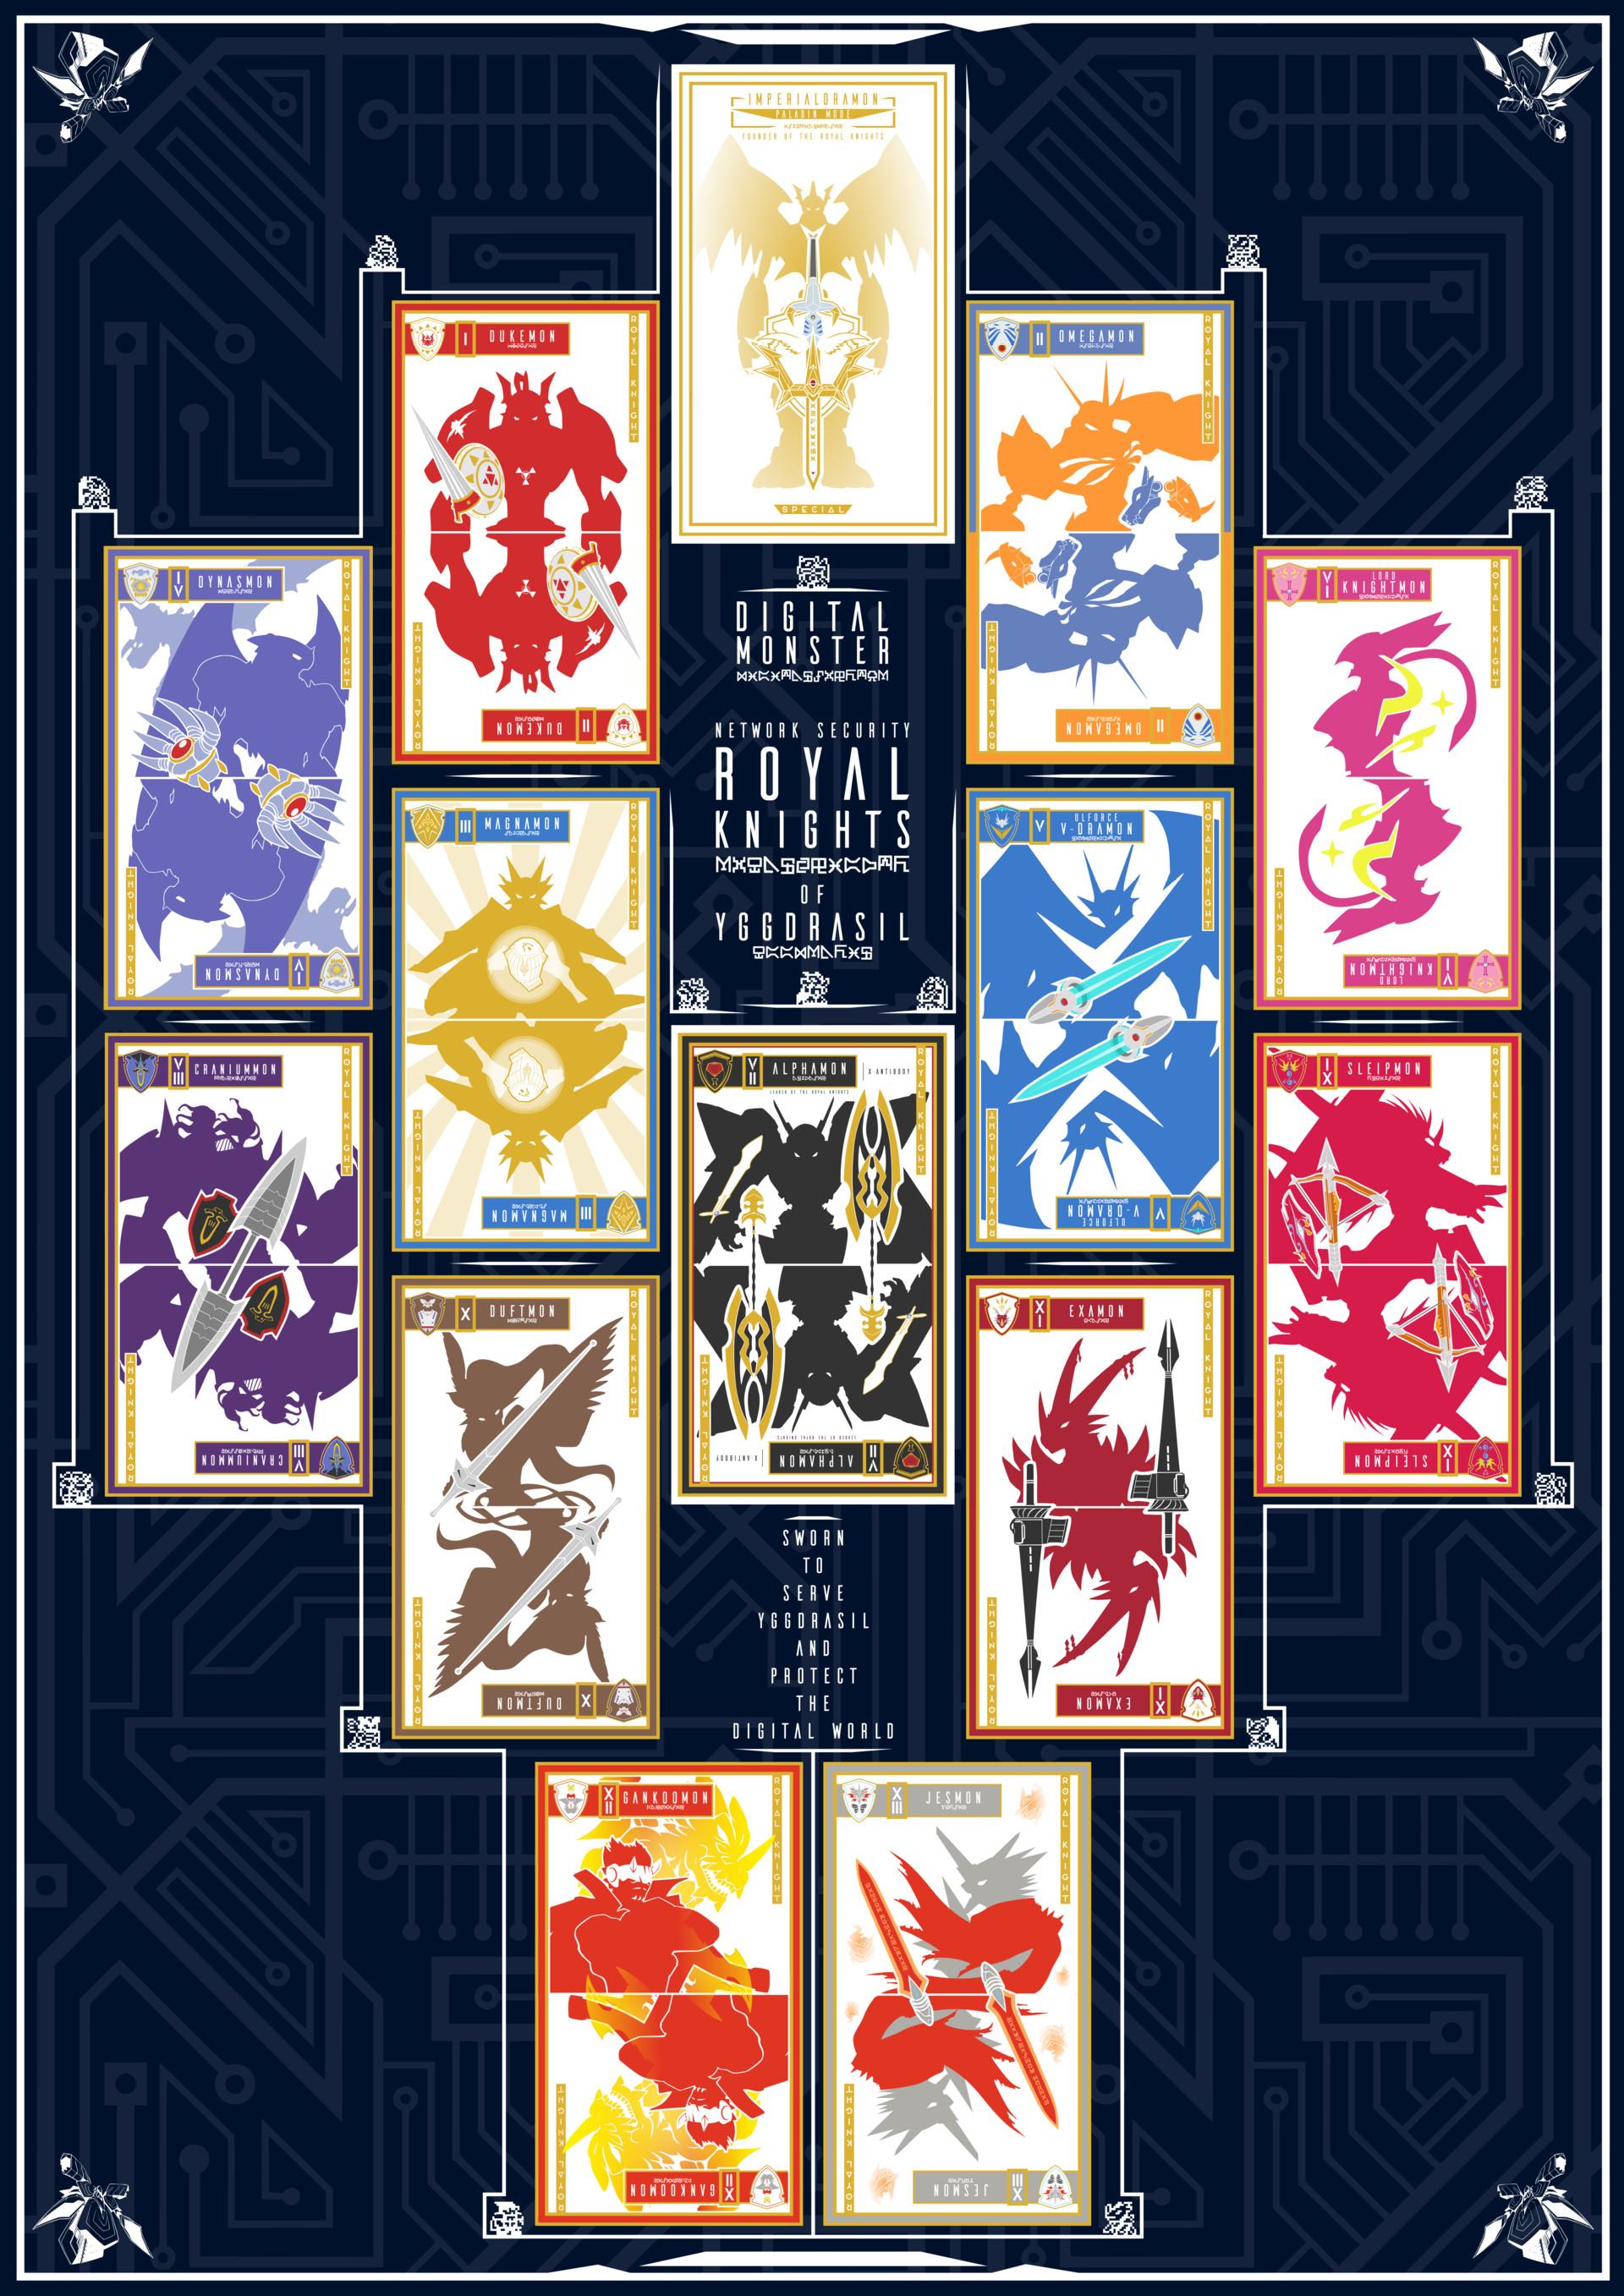 Artstation Digimon Knights Of Yggdrasil Royal Knights Card Set Joao Frias Digimon royal knights » jesmon. royal knights card set joao frias